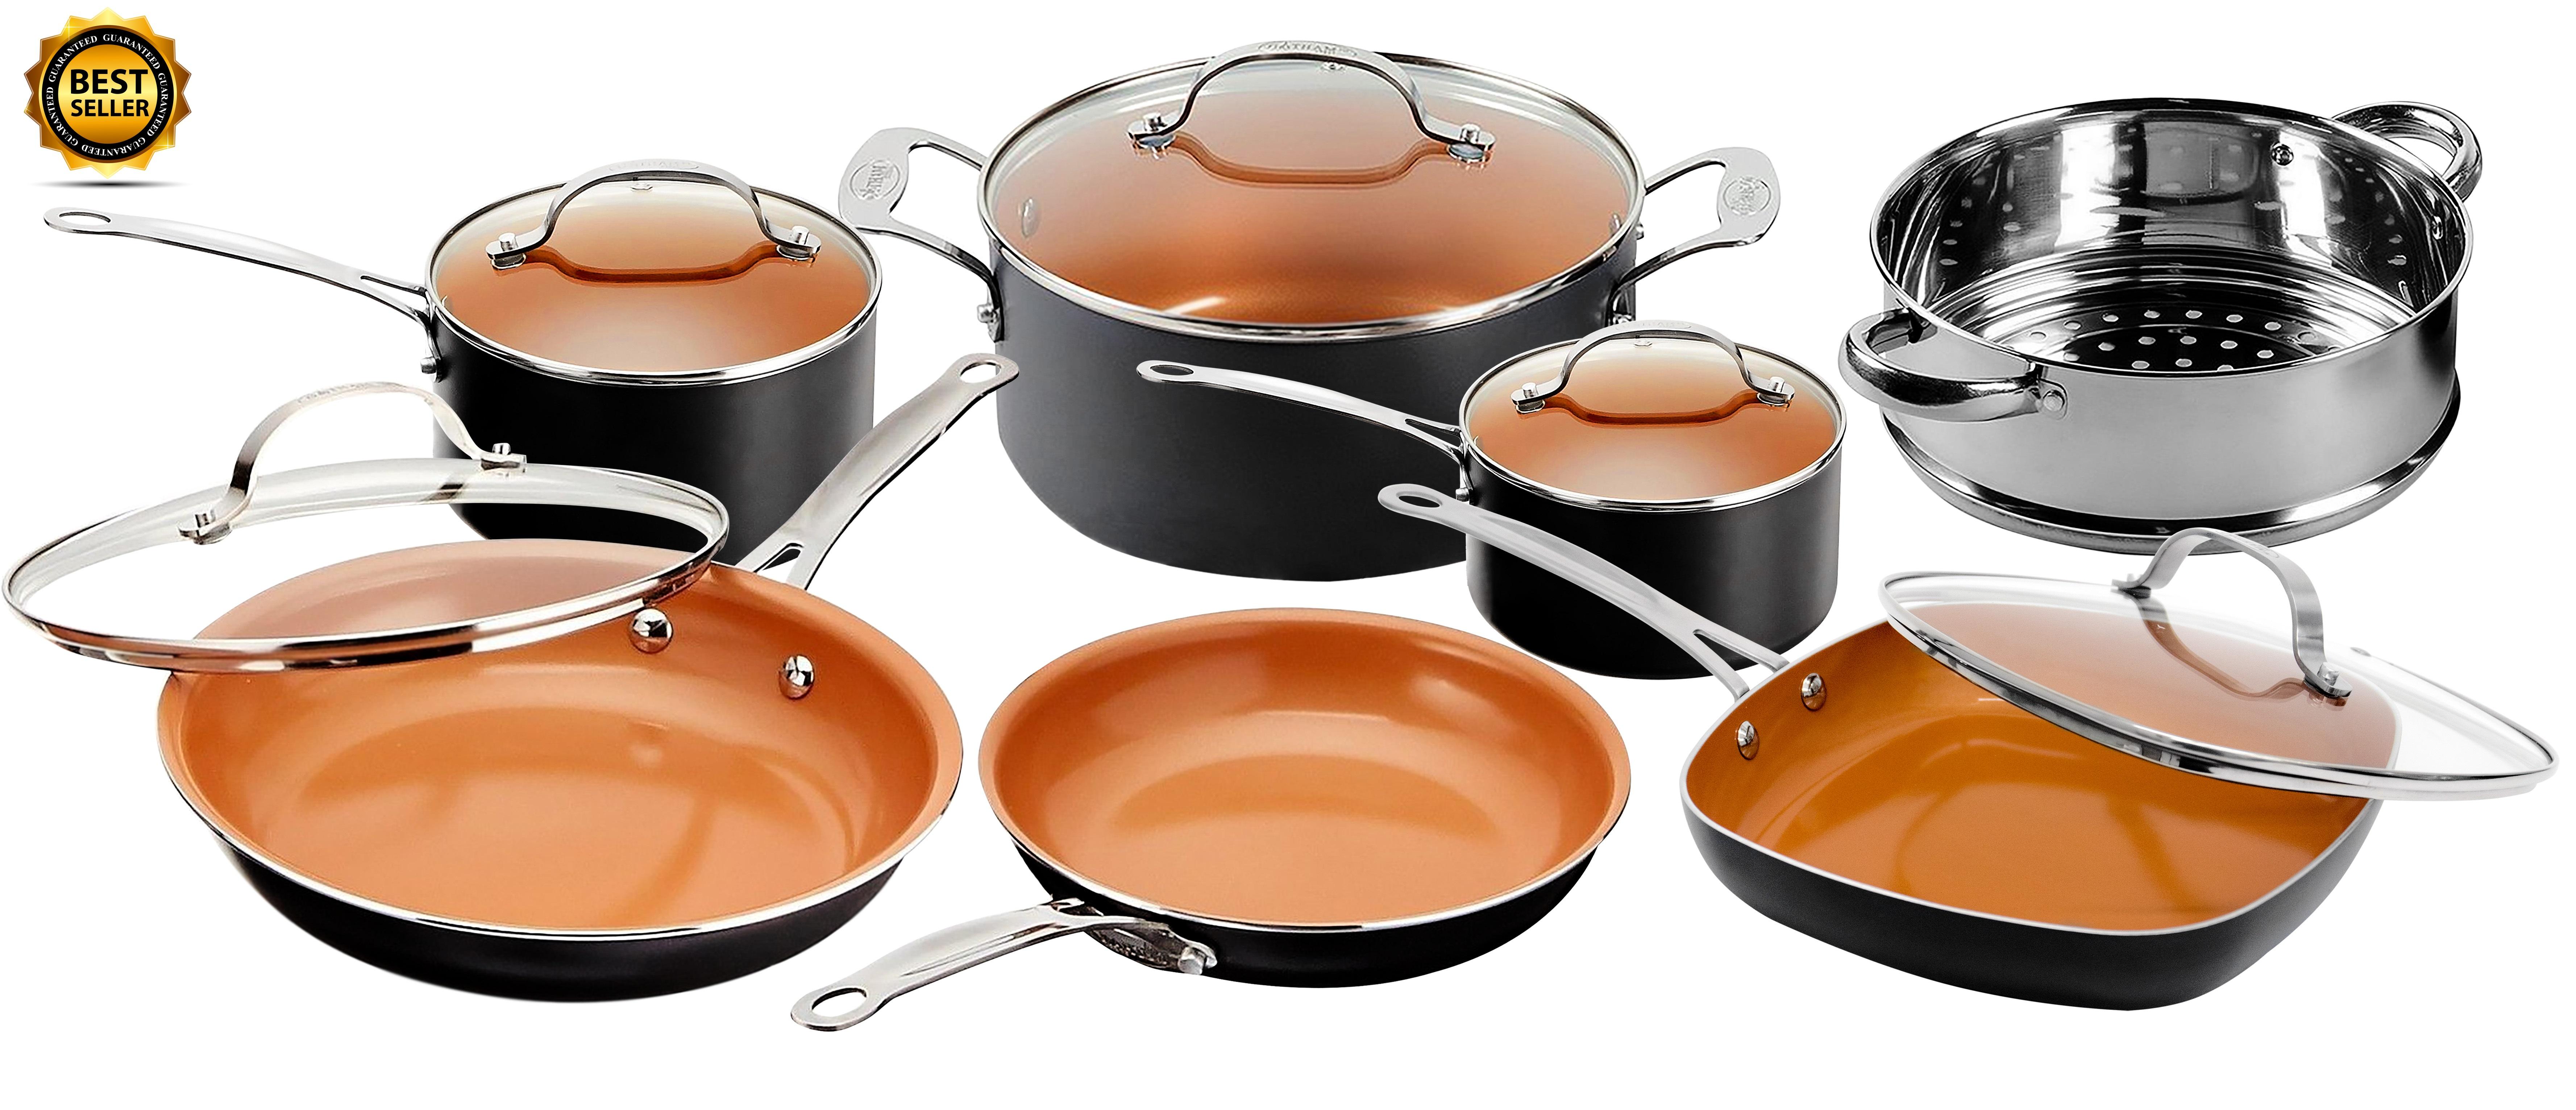 Gotham Steel 12 Piece Nonstick Ceramic Pots and Pans Cookware Se $79.88